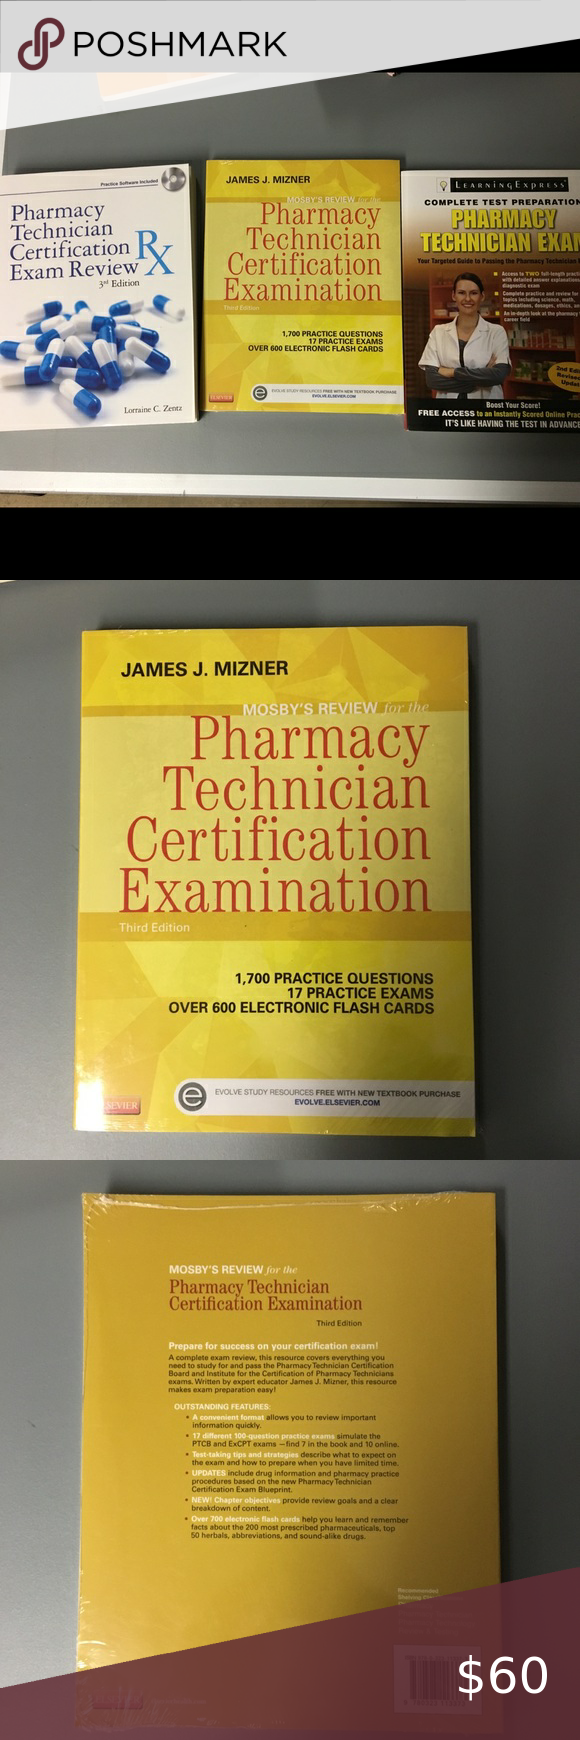 pharmacy technician certification yellow practice exam poshmark valued